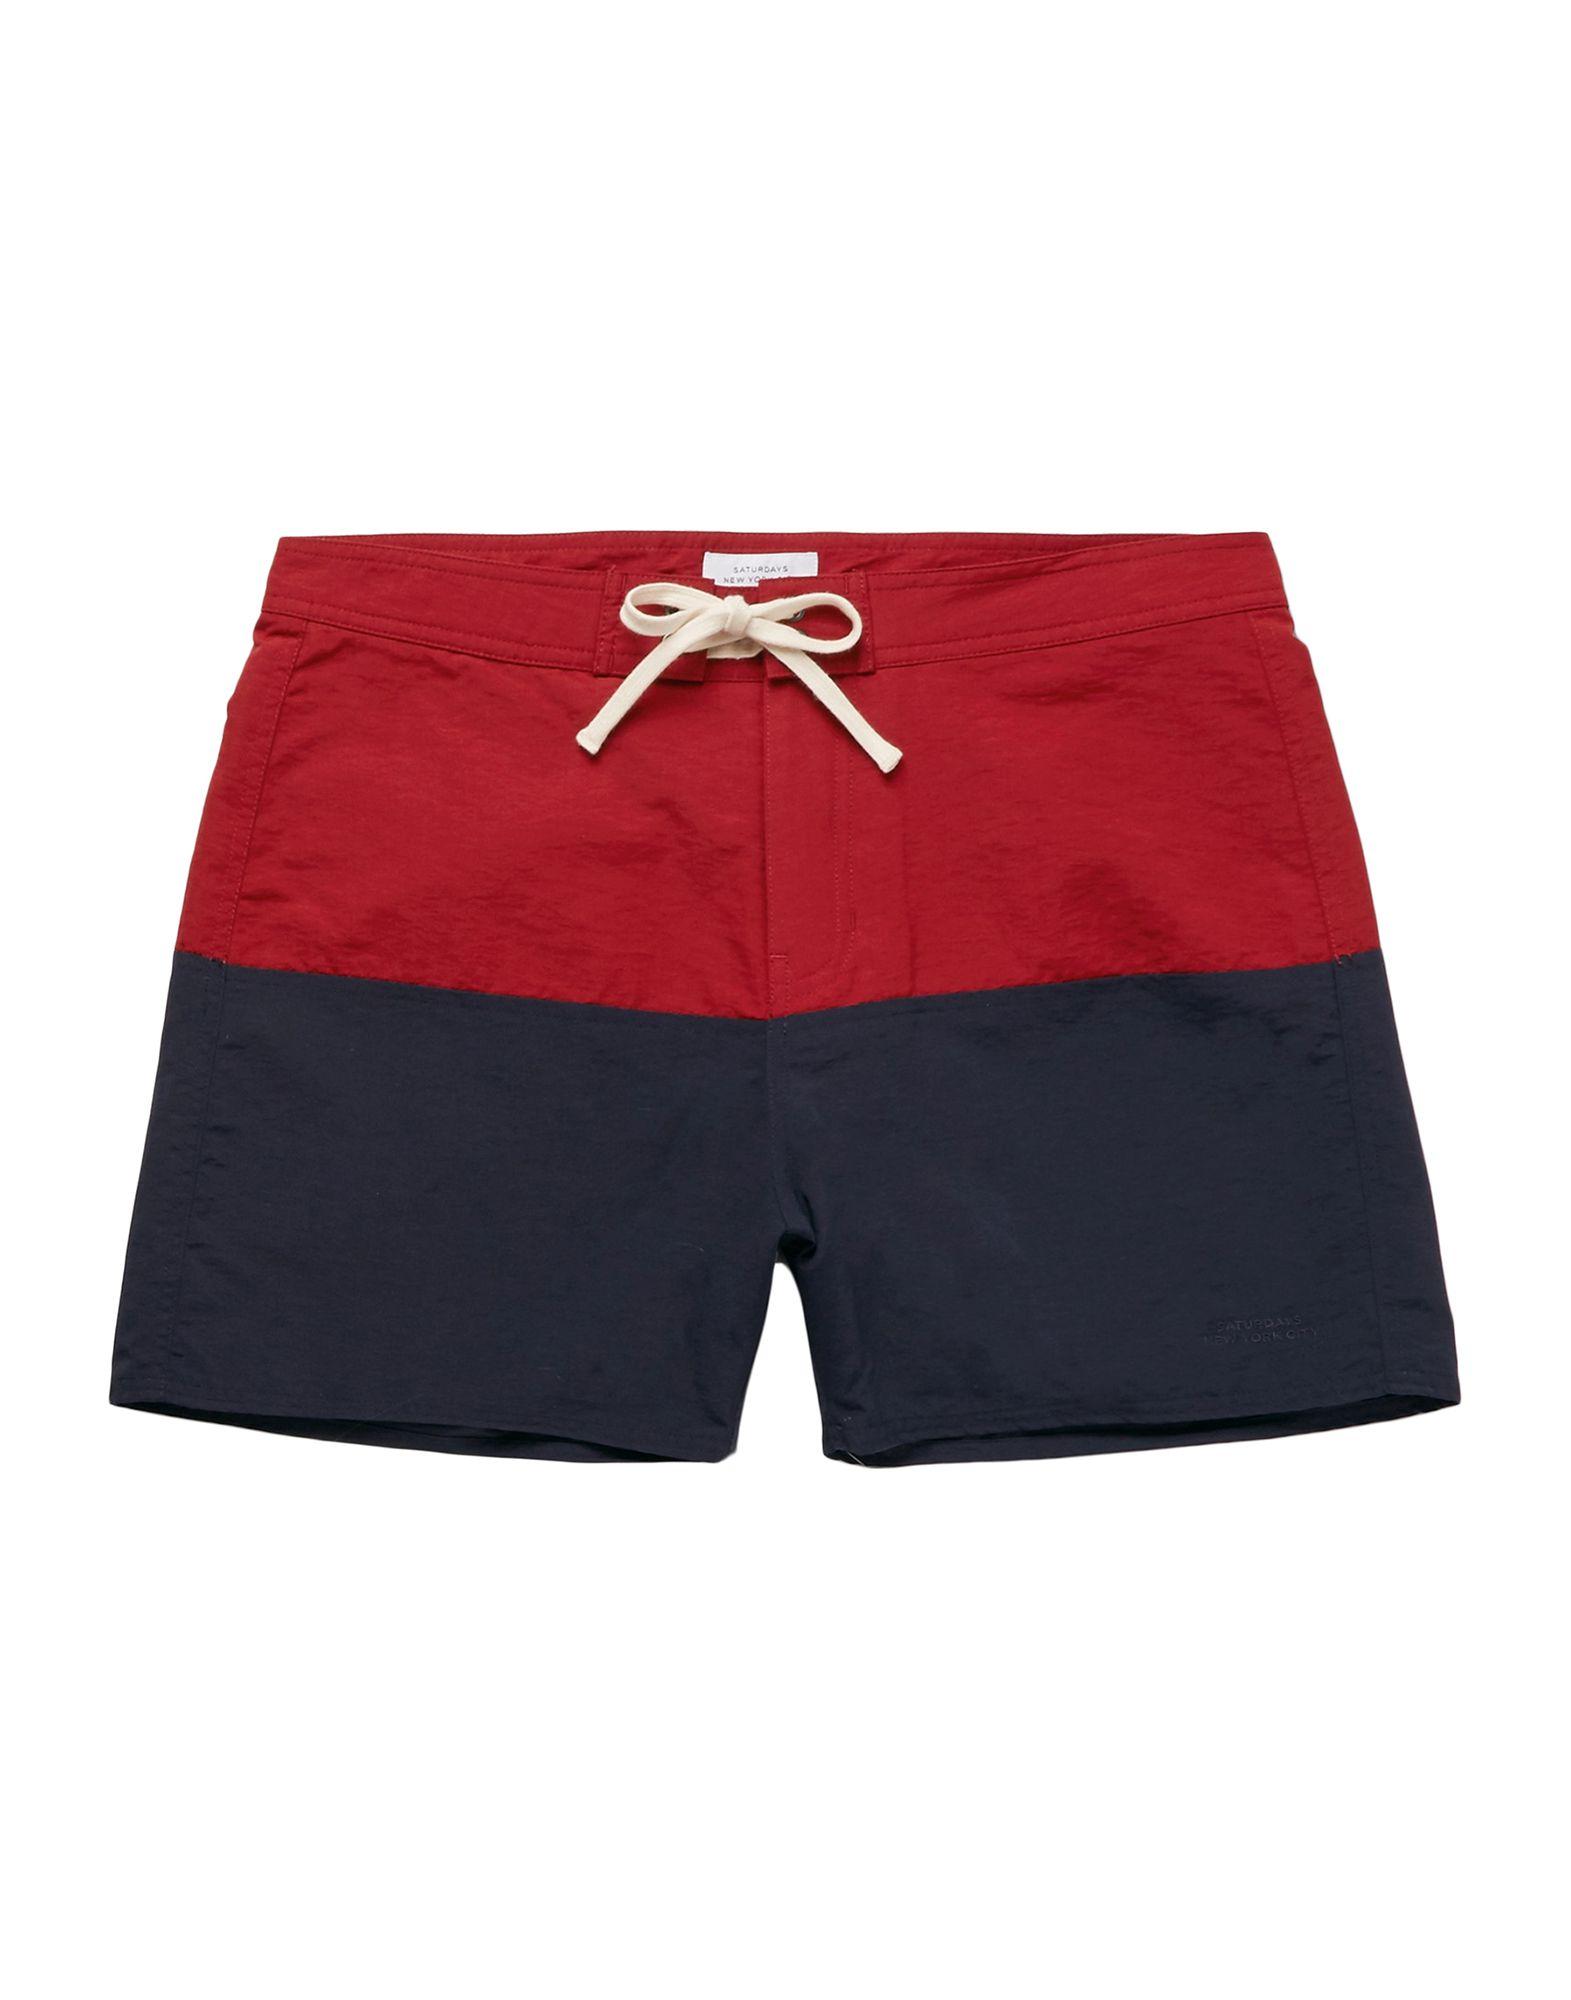 SATURDAYS NEW YORK CITY Пляжные брюки и шорты saturdays new york city пляжные брюки и шорты